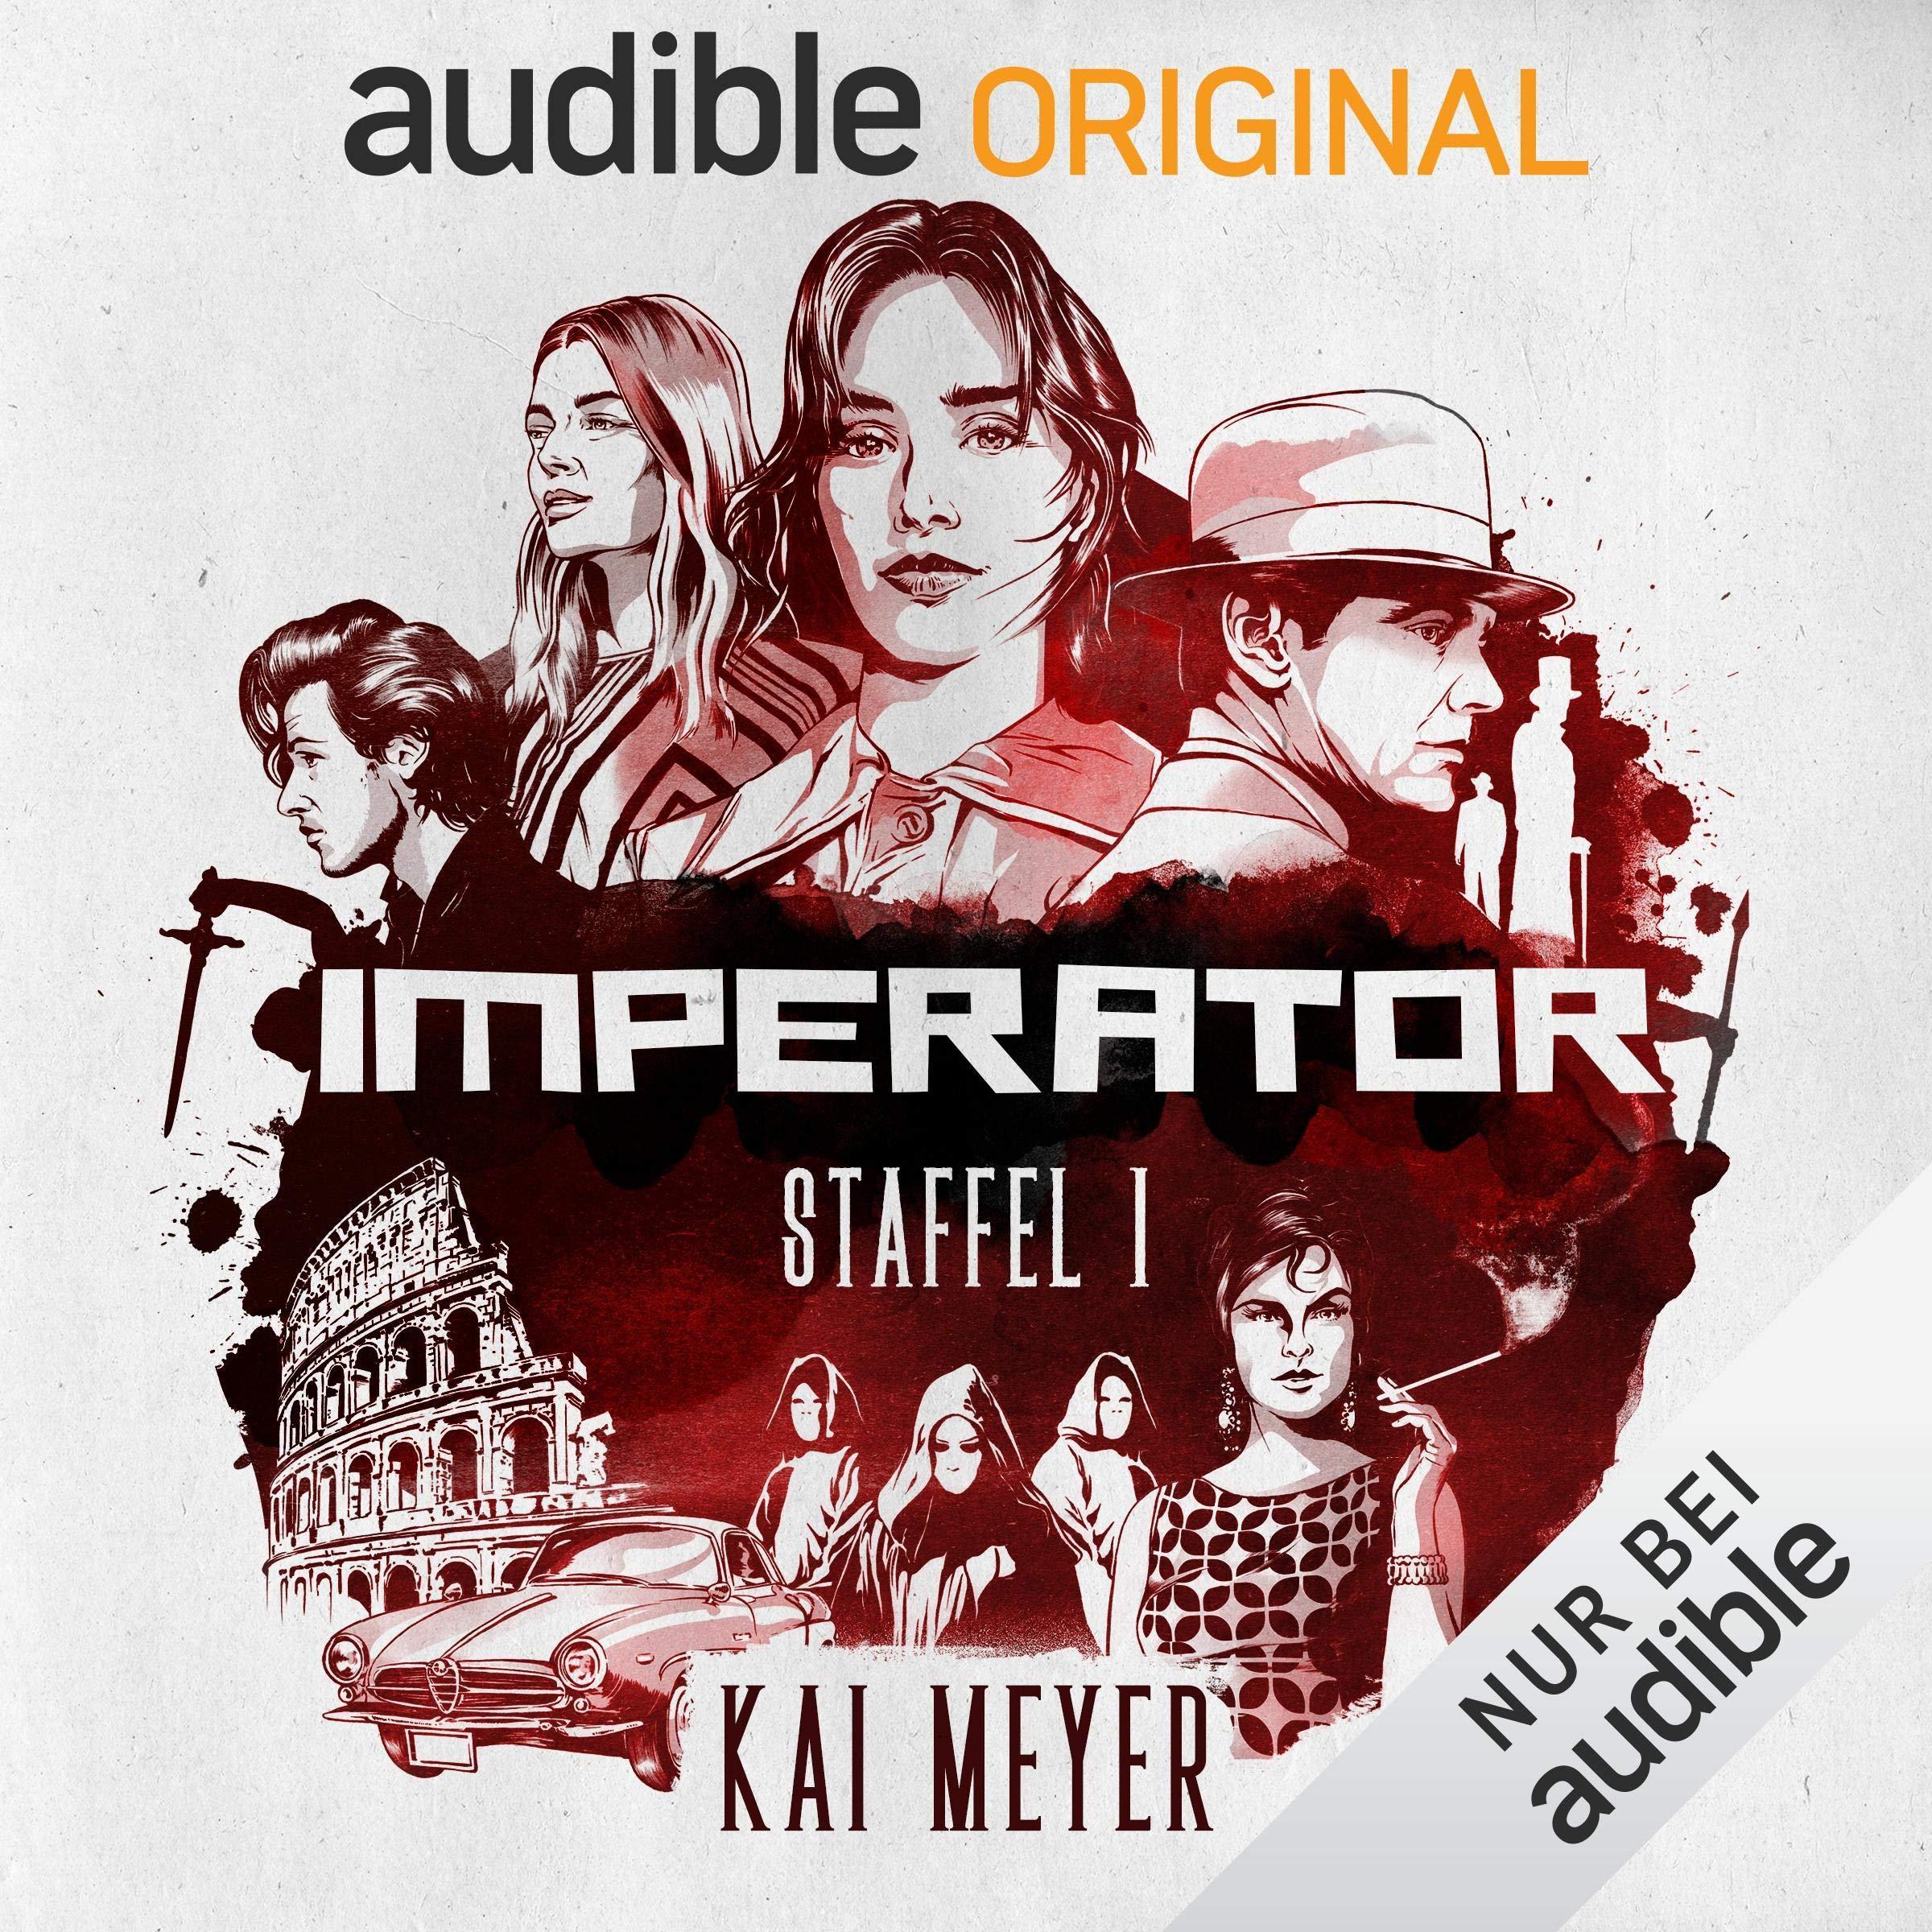 Imperator, Staffel 1